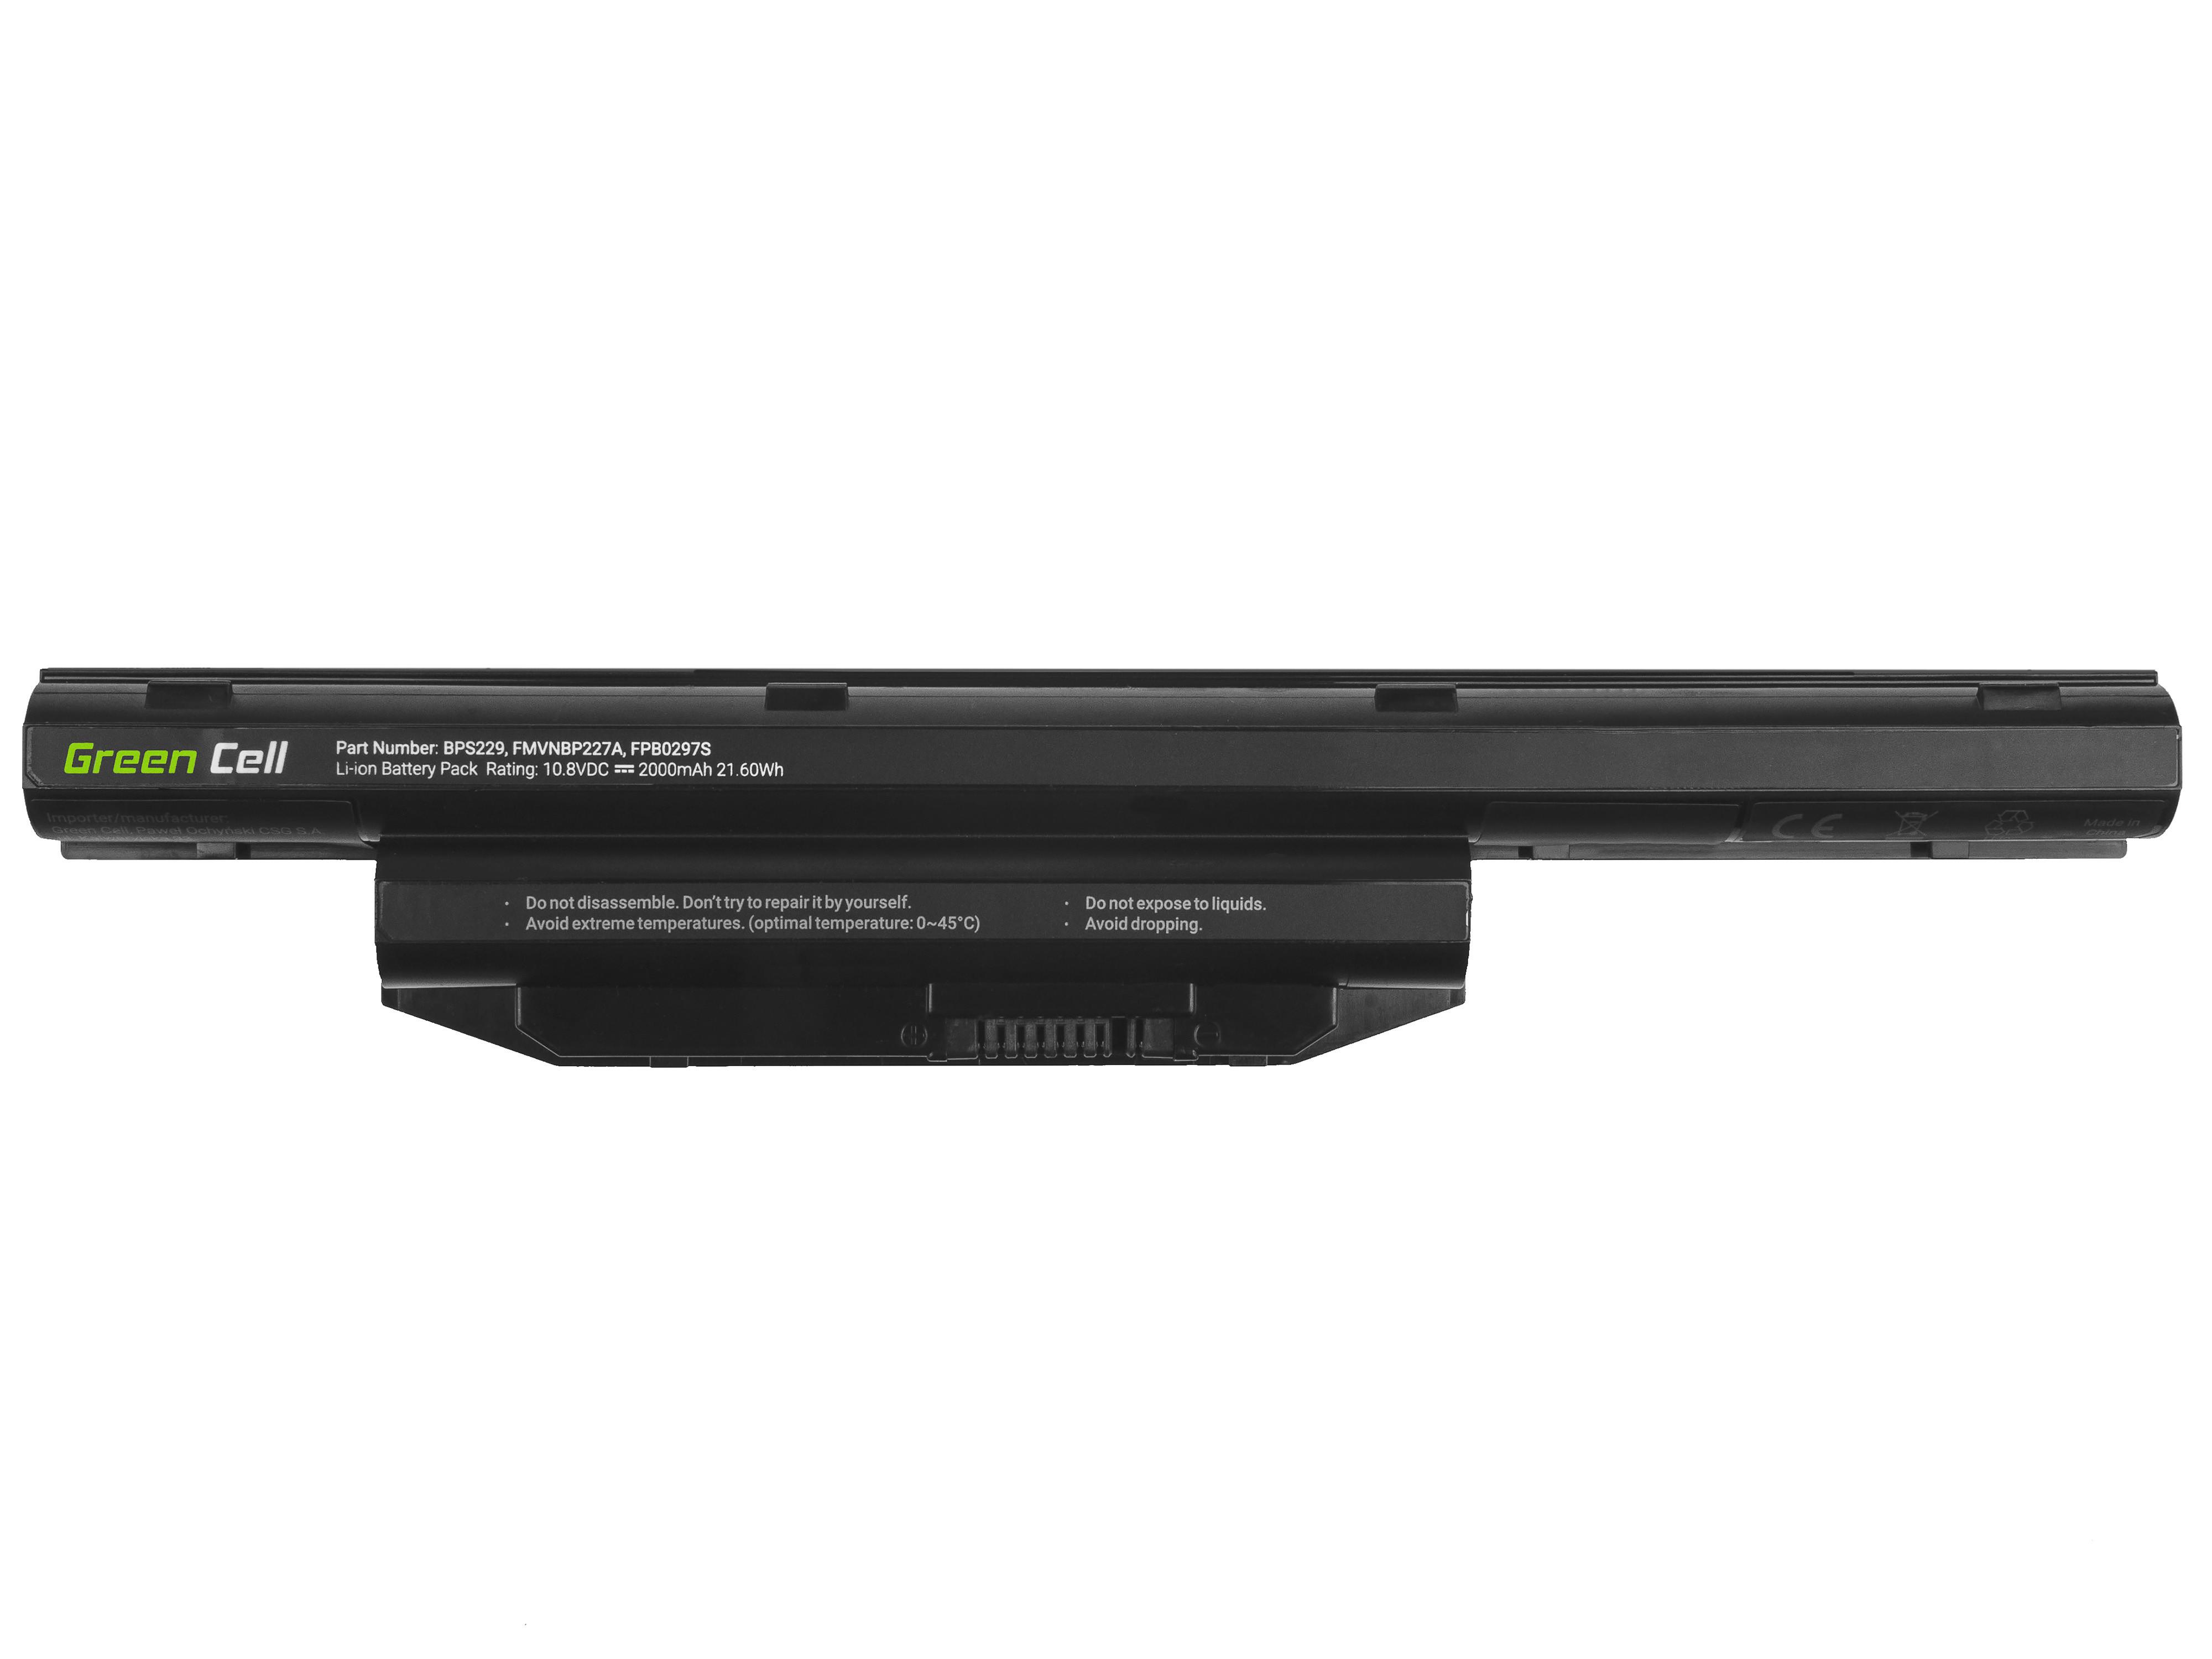 Green Cell Laptop Baterie Baterie pro Fujitsu LifeBook A514 A544 A555 AH544 AH564 E547 E554 E733 E734 E743 E744 E746 E753 E754 S904